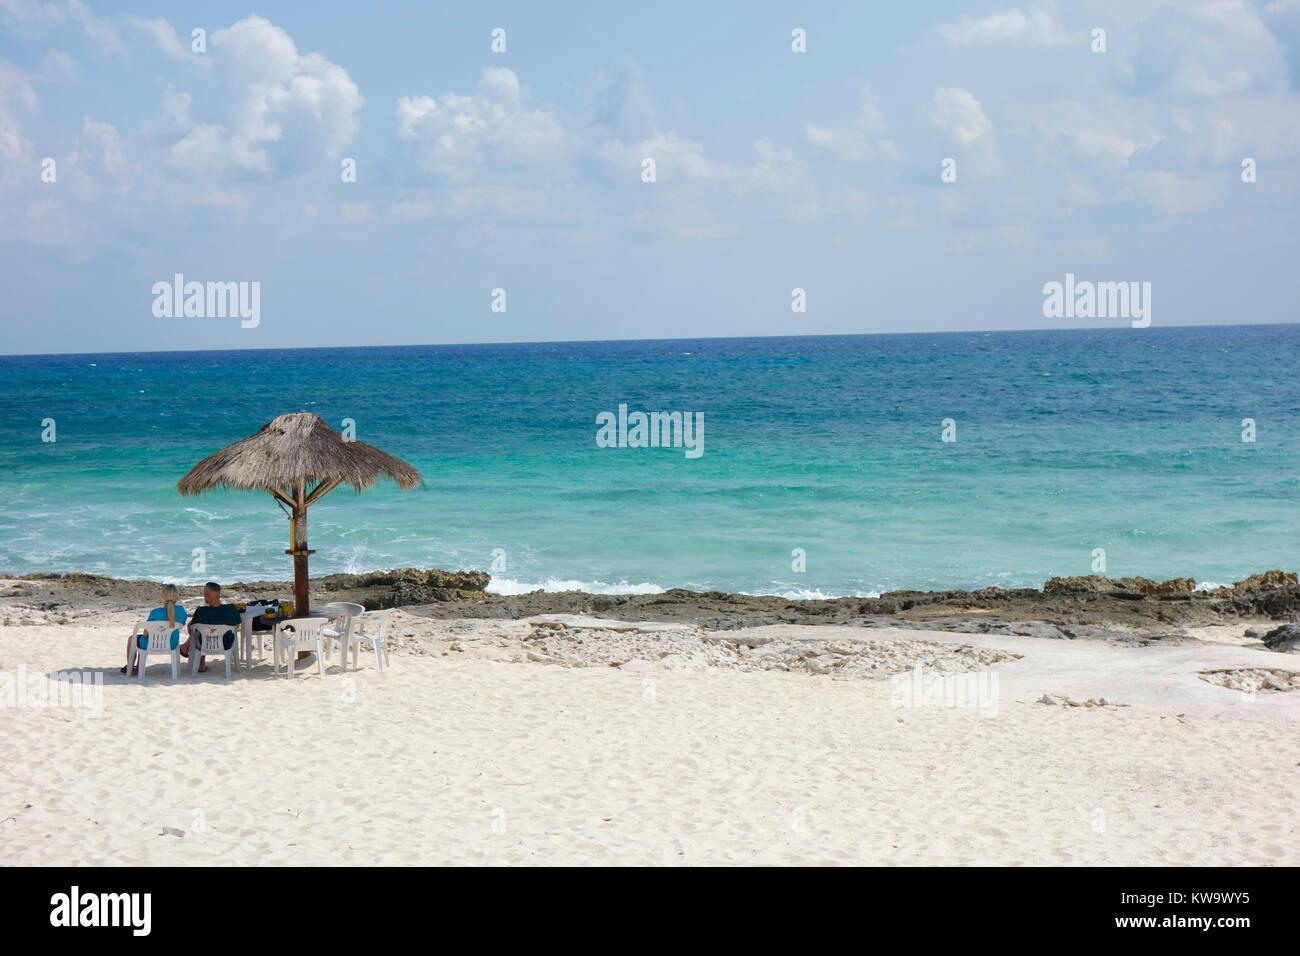 Playa San Martin, Cozumel Mexico. - Stock Image